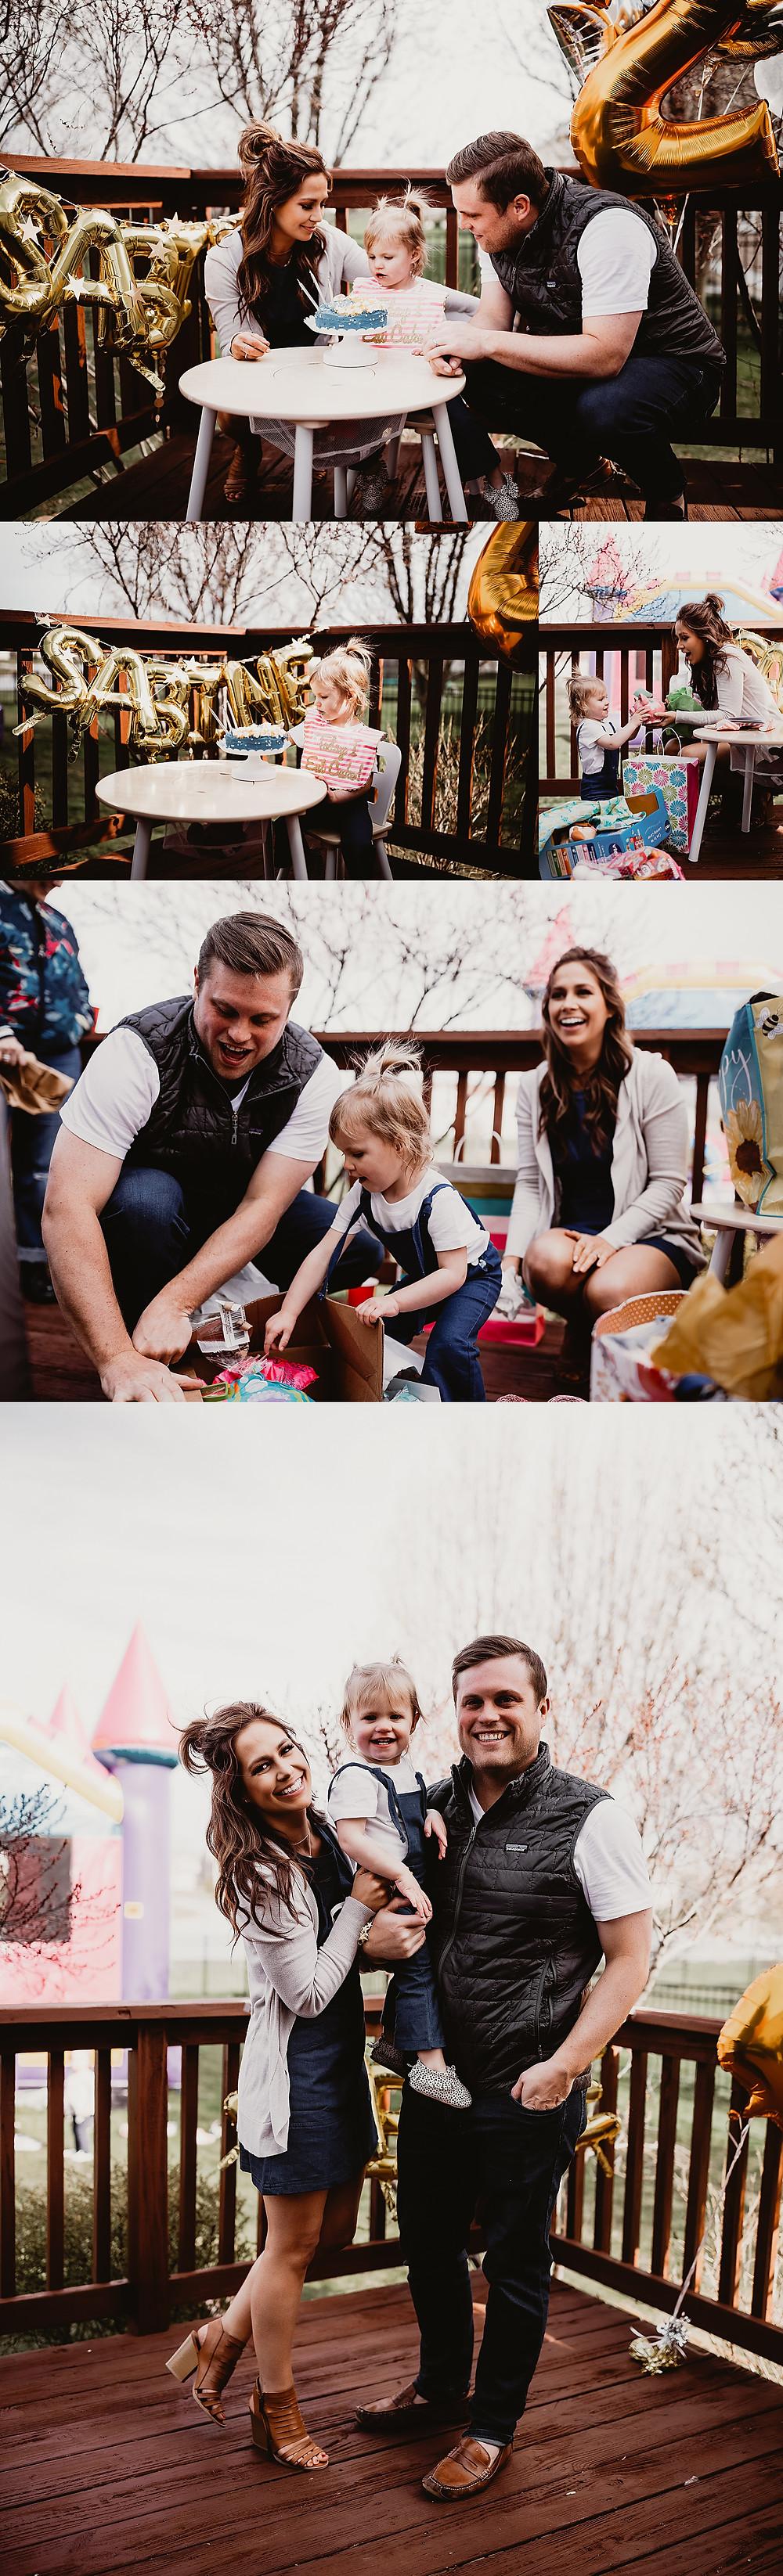 Carmel Indiana Family Photographer, Alex Morris Design